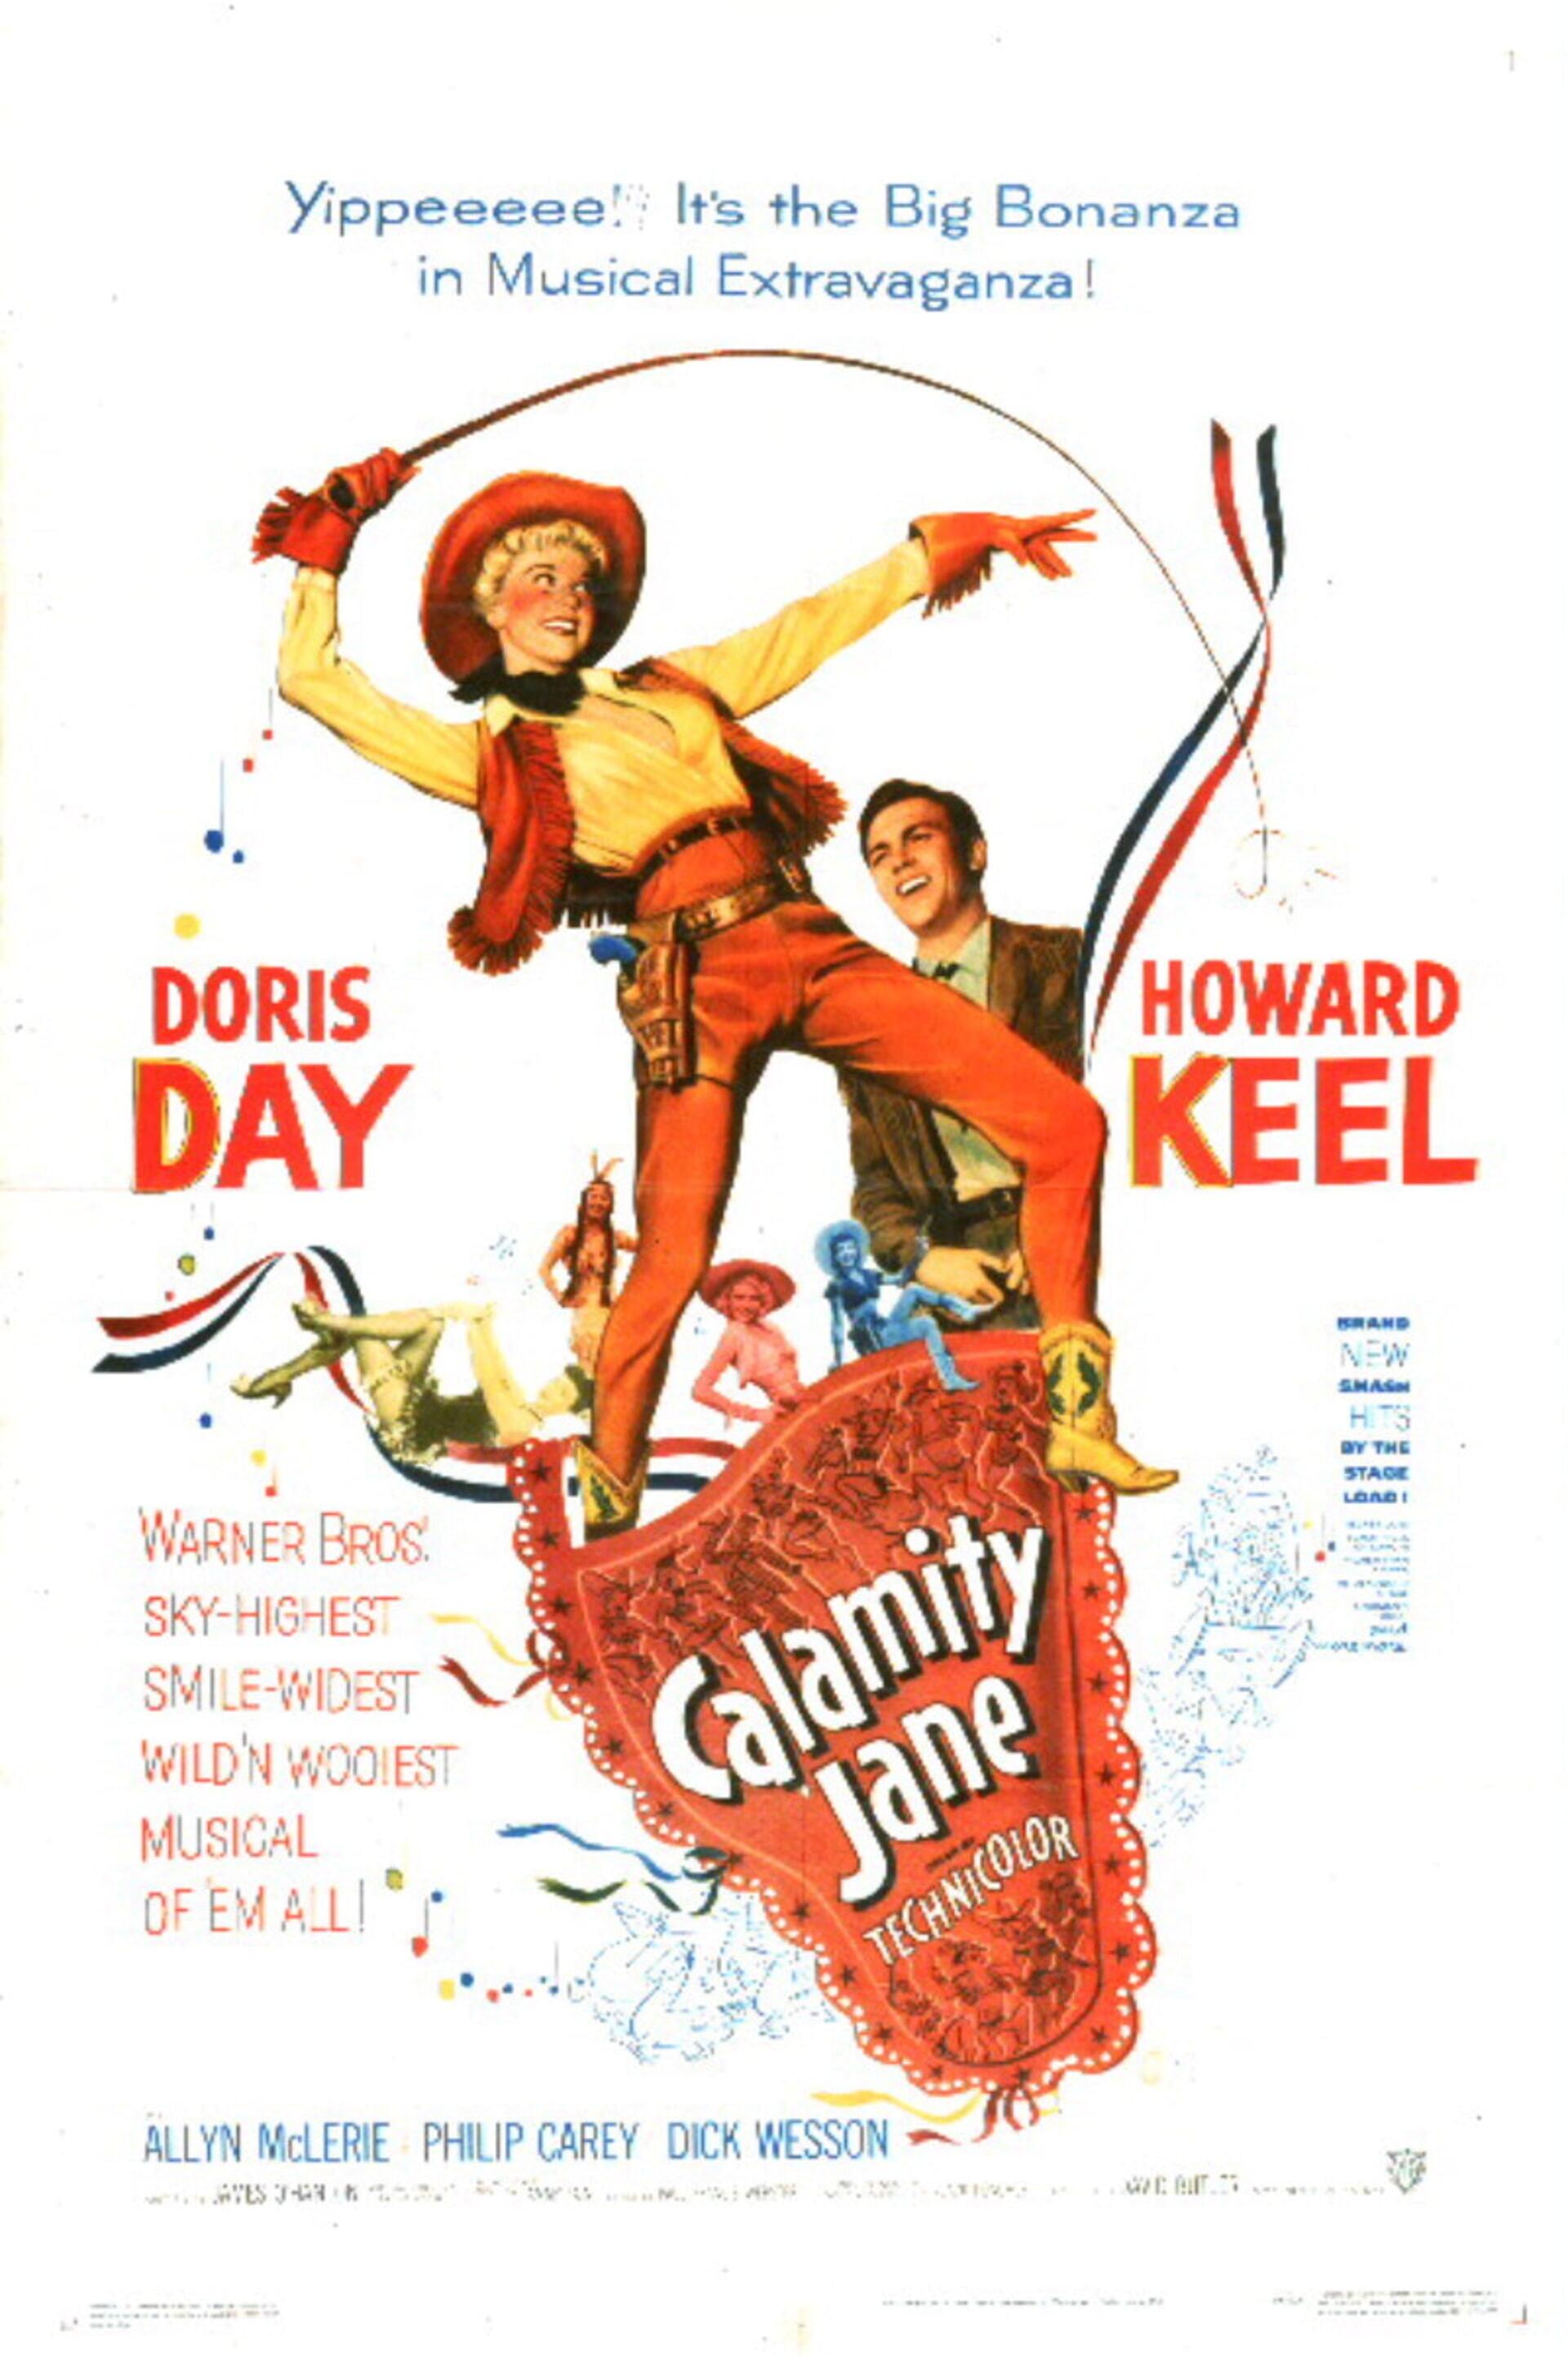 Calamity Jane - Poster 1